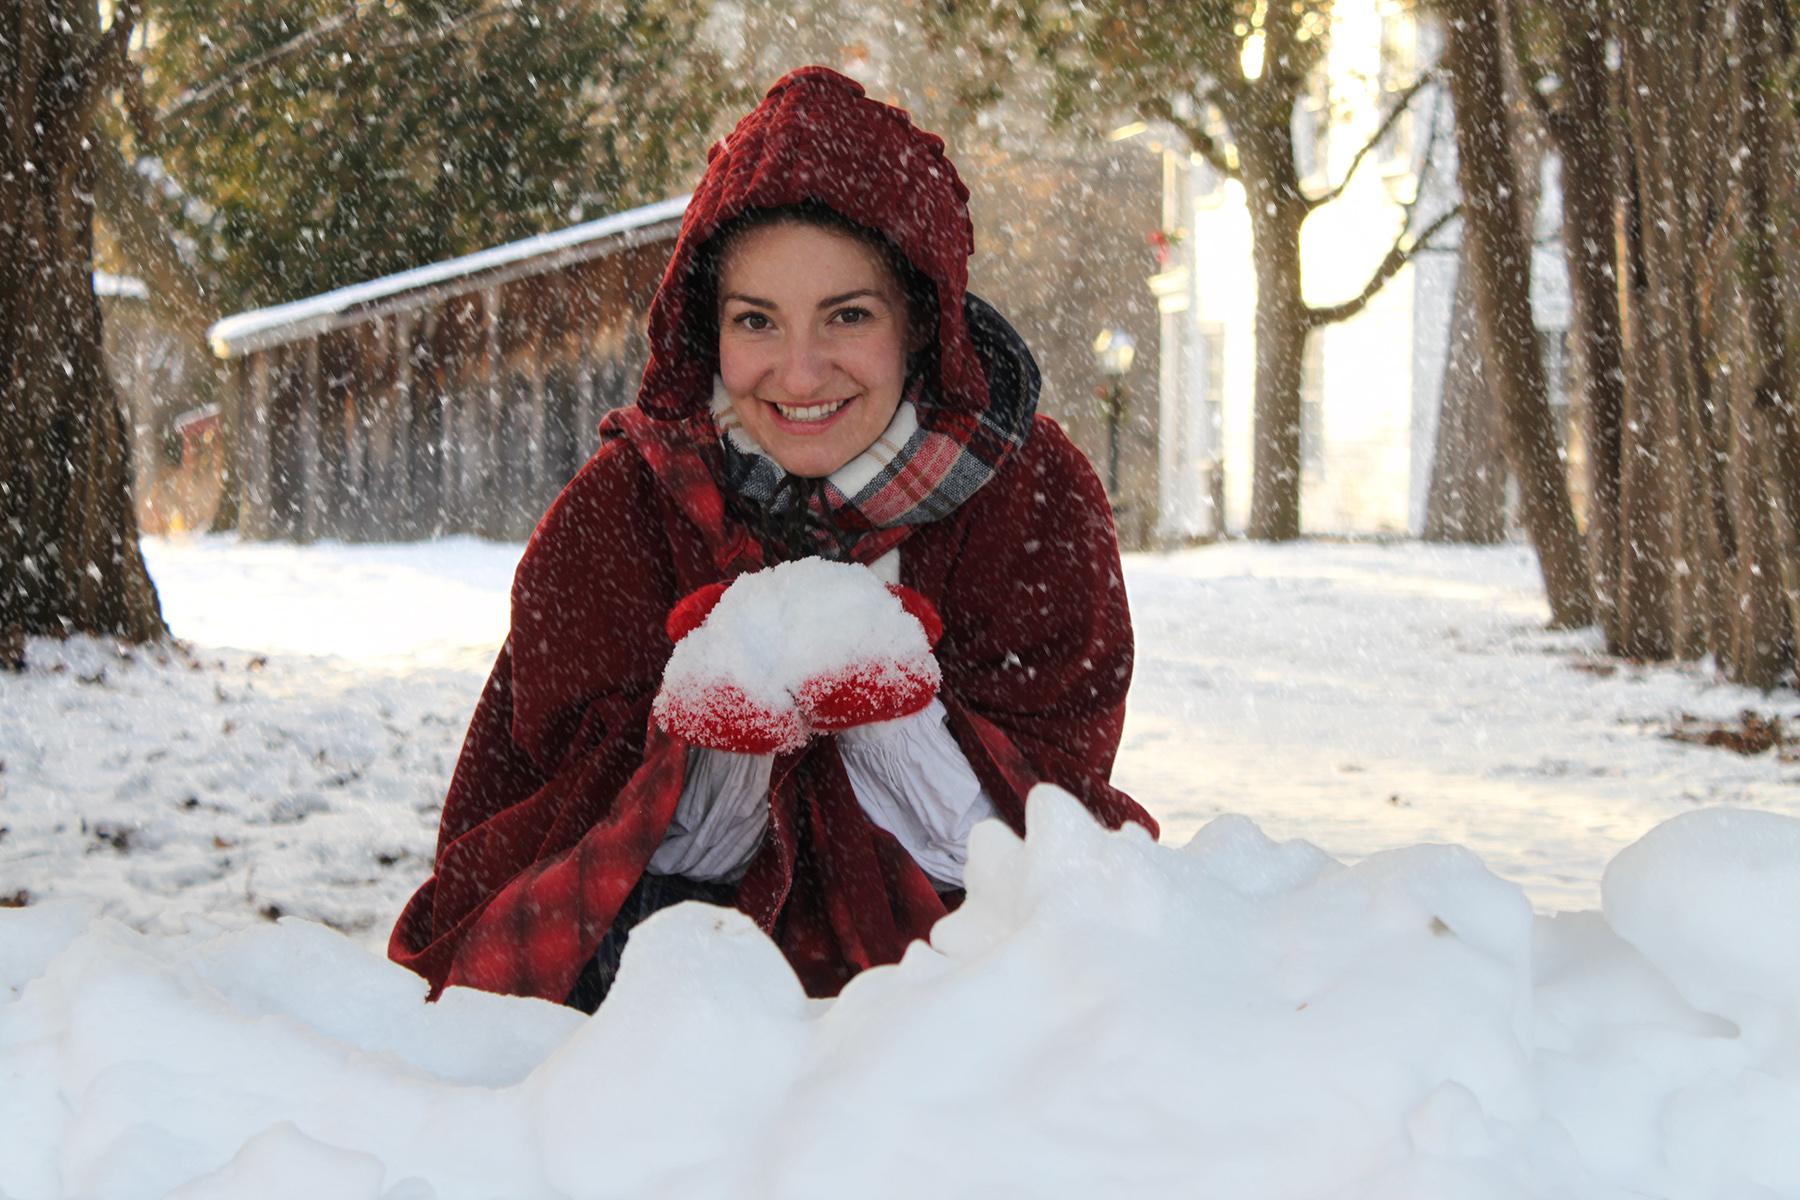 History actor in 19th century costume enjoys winter scene at Black Creek Pioneer Village